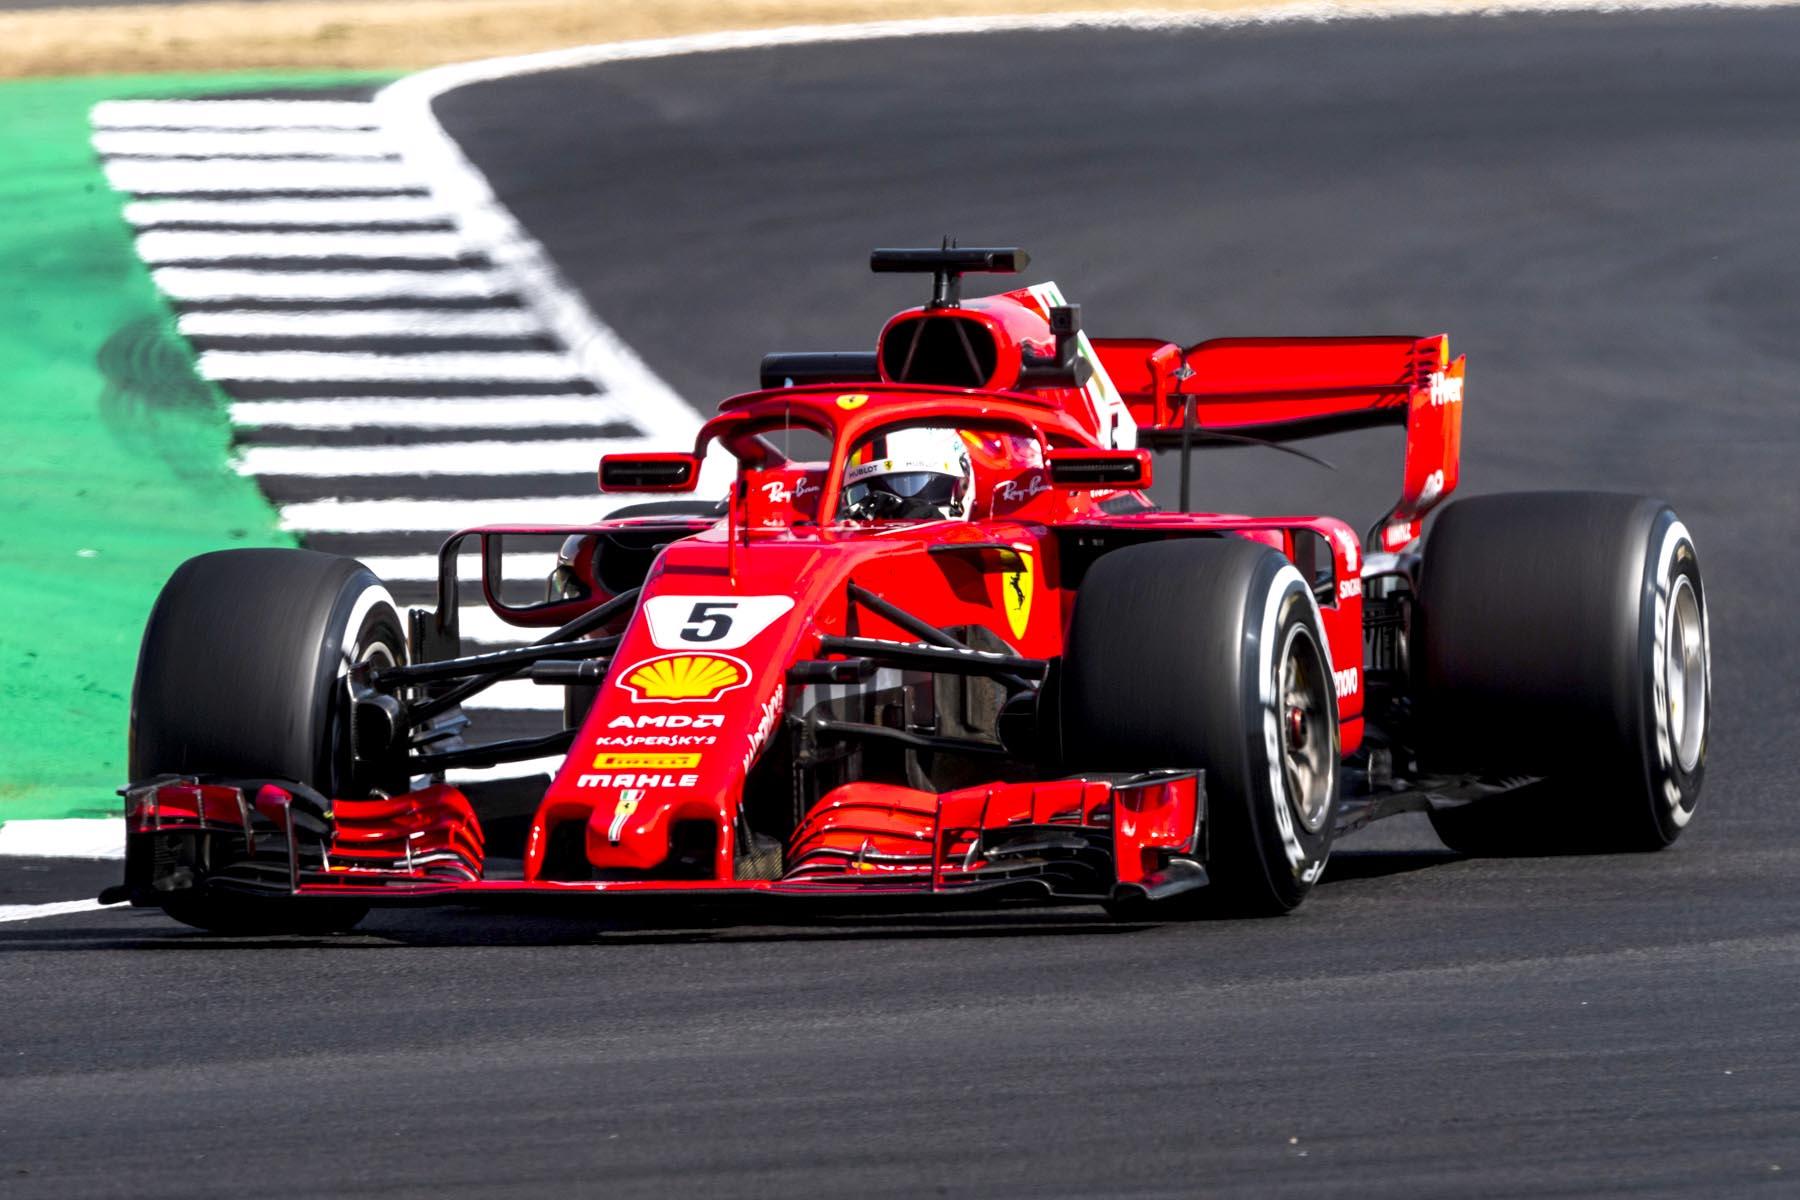 Sebastian Vettel on track during practice at the 2018 British Grand Prix.